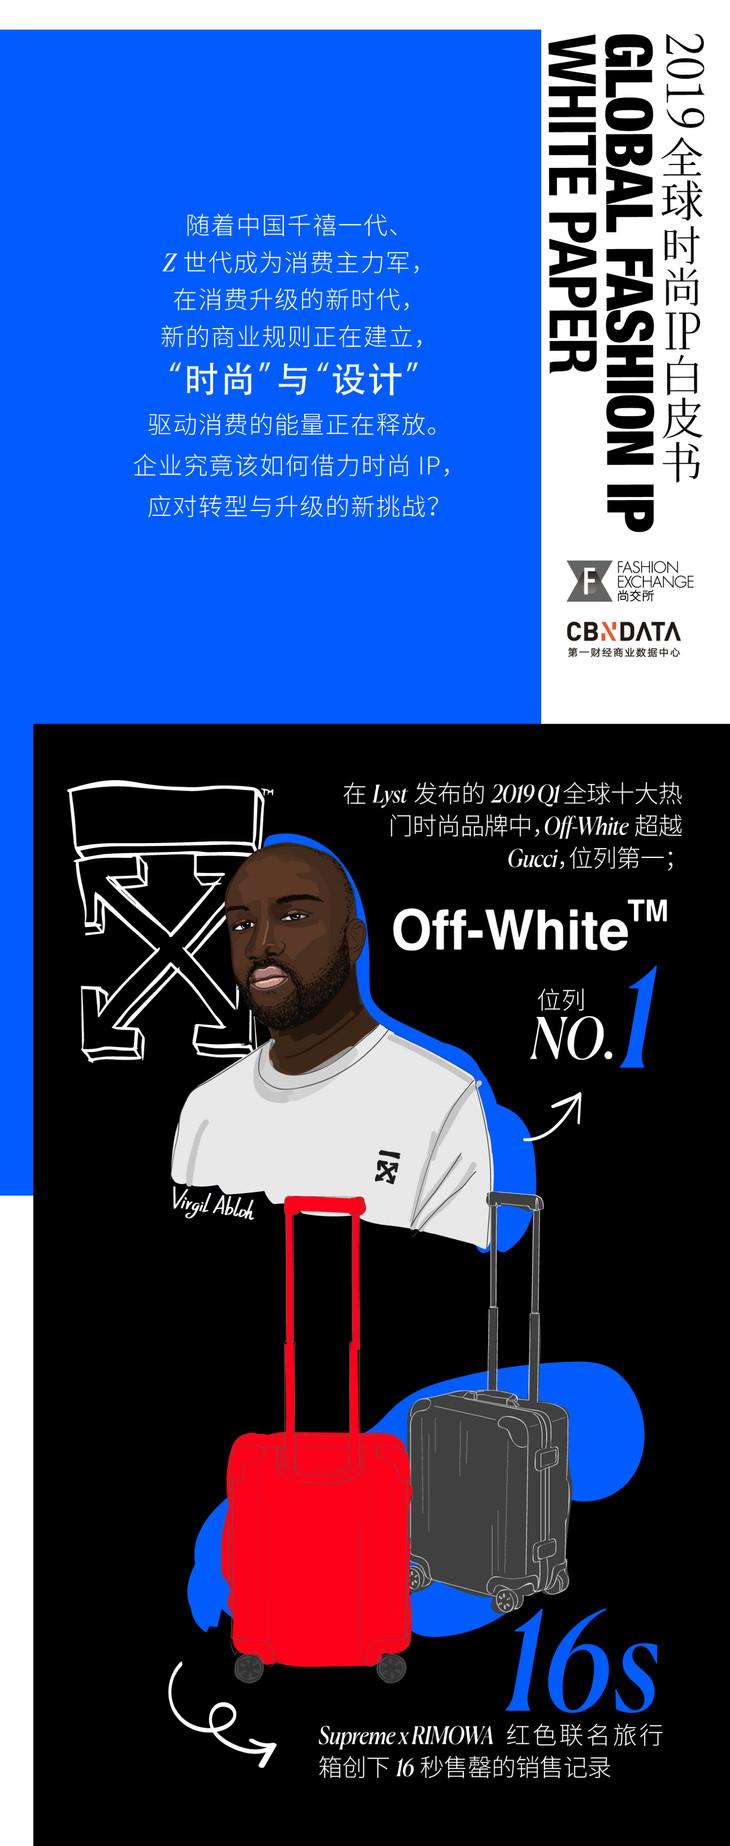 CBNData)联合尚交所共同发布2019全球时尚IP榜《Fashion IP 100》与《2019全球时尚IP白皮书》 - 1